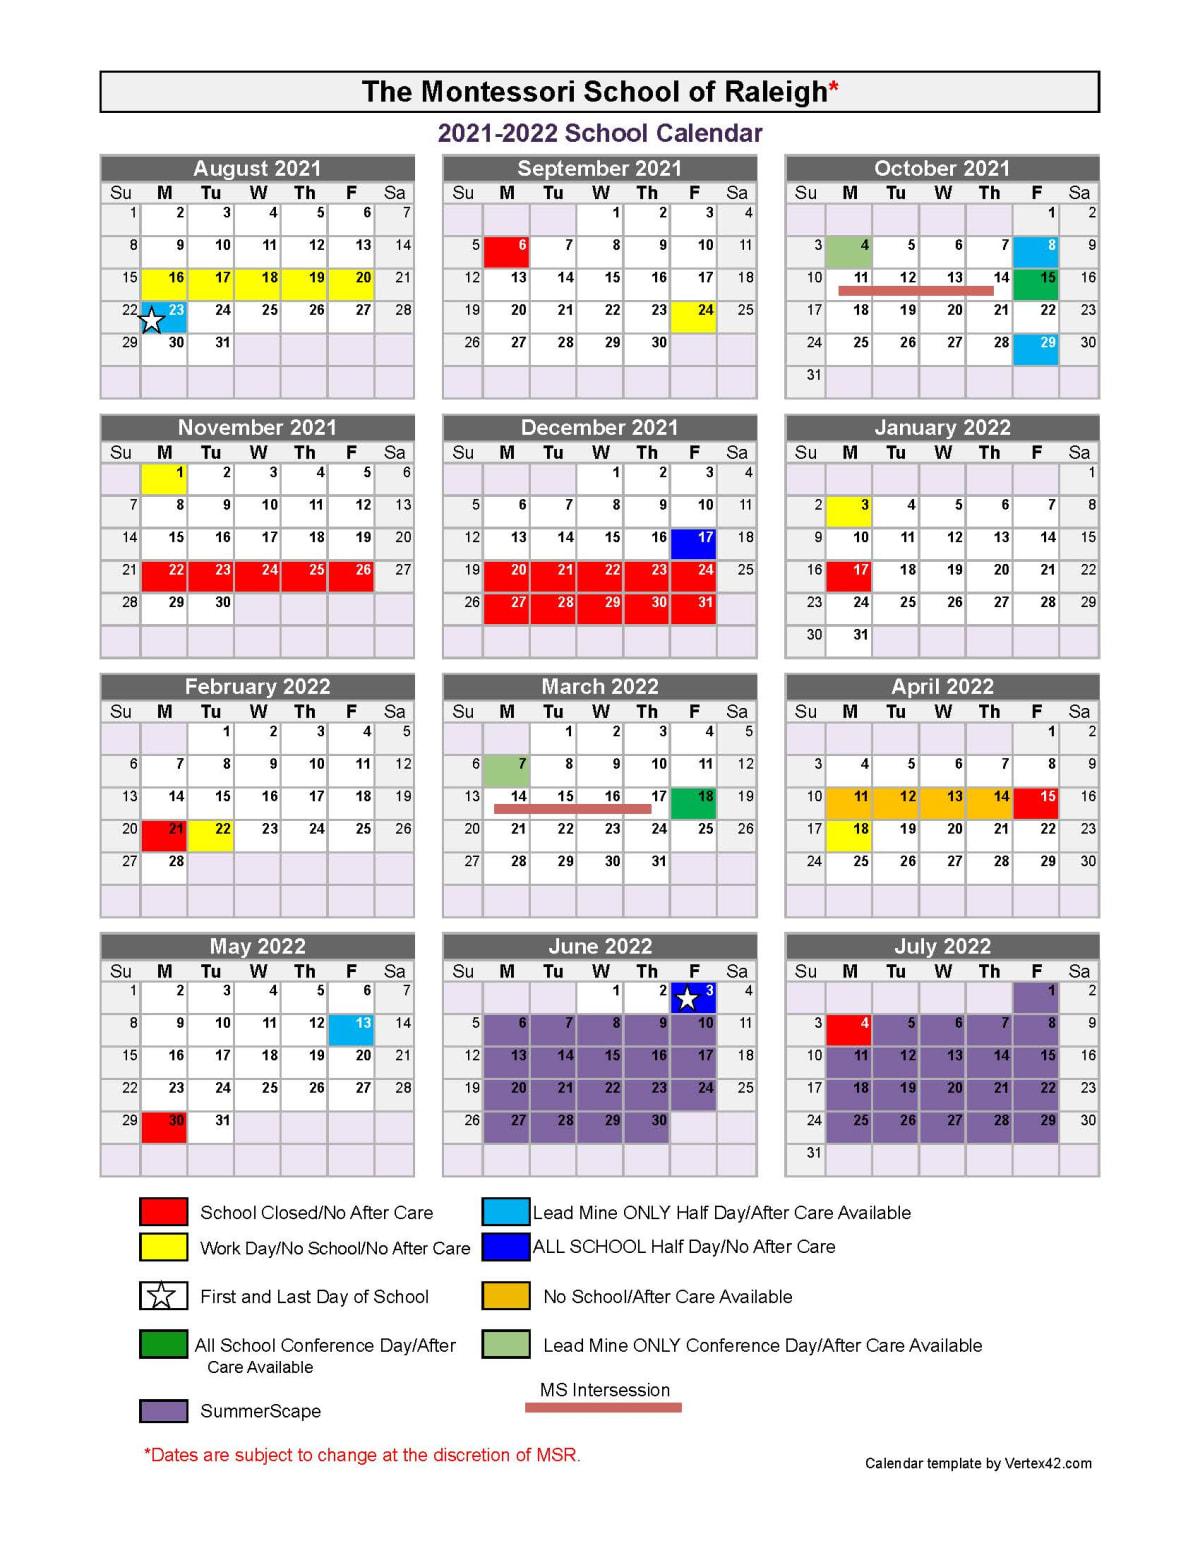 Uncg Academic Calendar Spring 2022.Academic Calendar Montessori School Of Raleigh